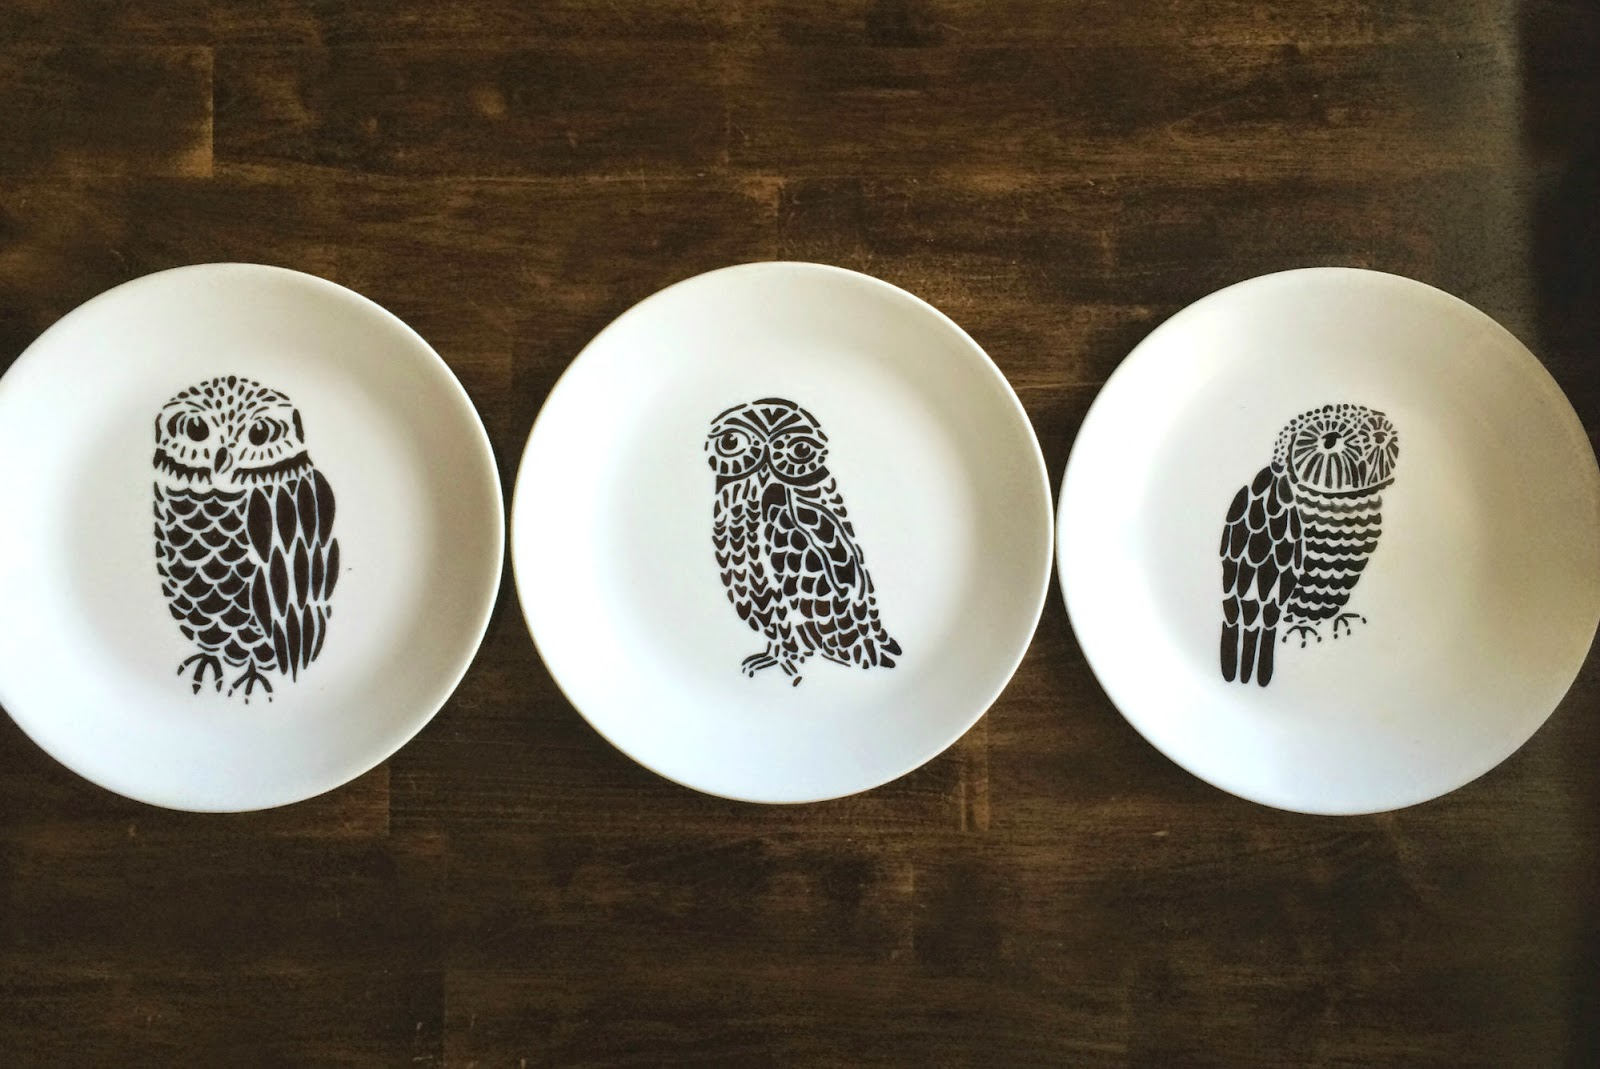 designer plates - stencilgirl talk porcelain plates and stencils by stencilgirl